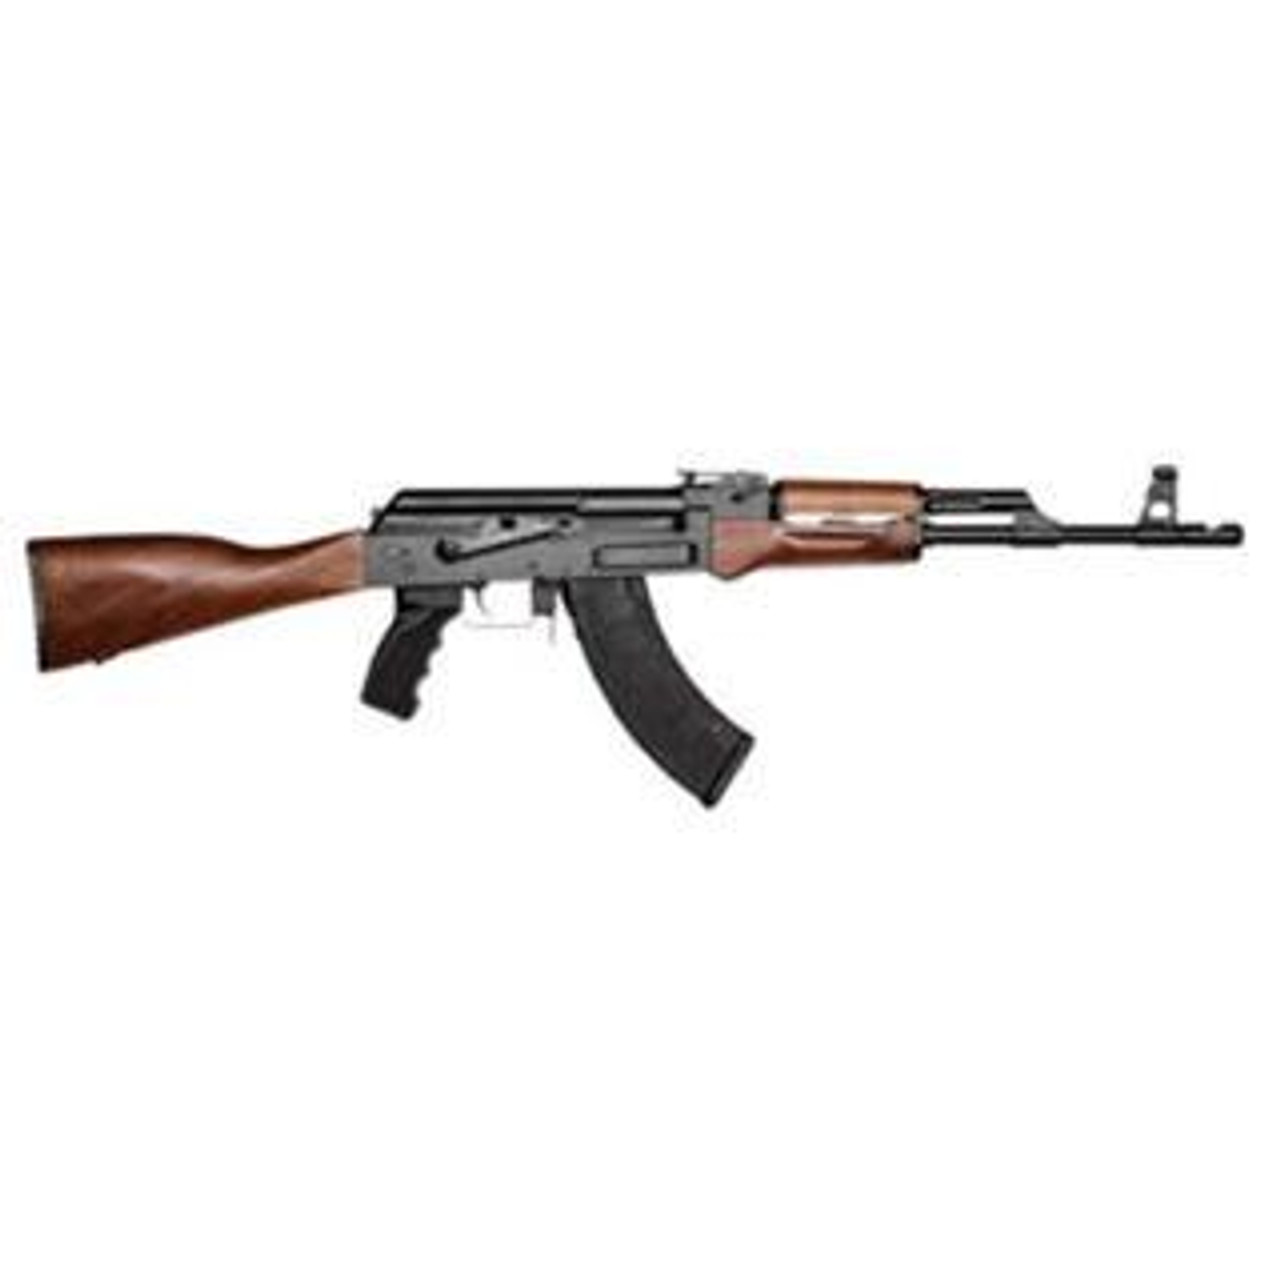 Century Arms C39v2 AK47 CALIFORNIA 7.62x39